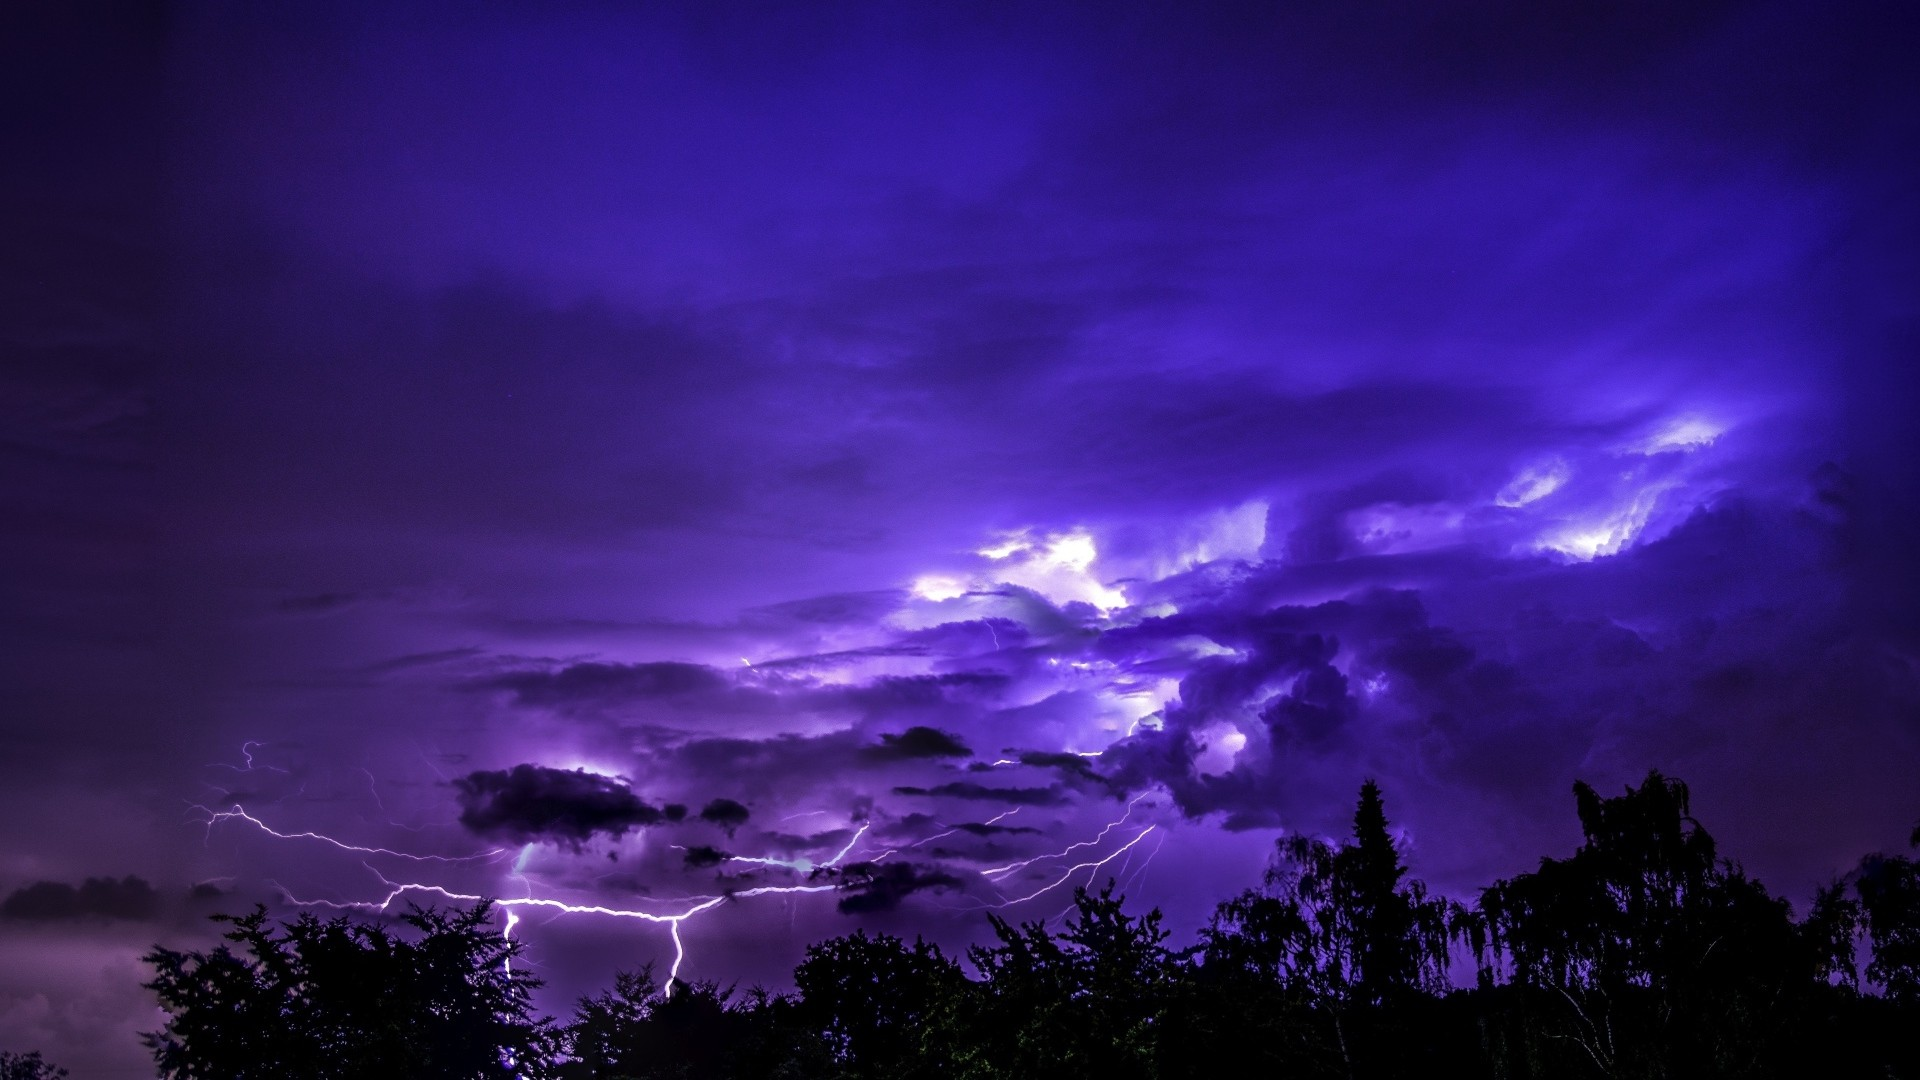 Purple Sky Background Wallpaper